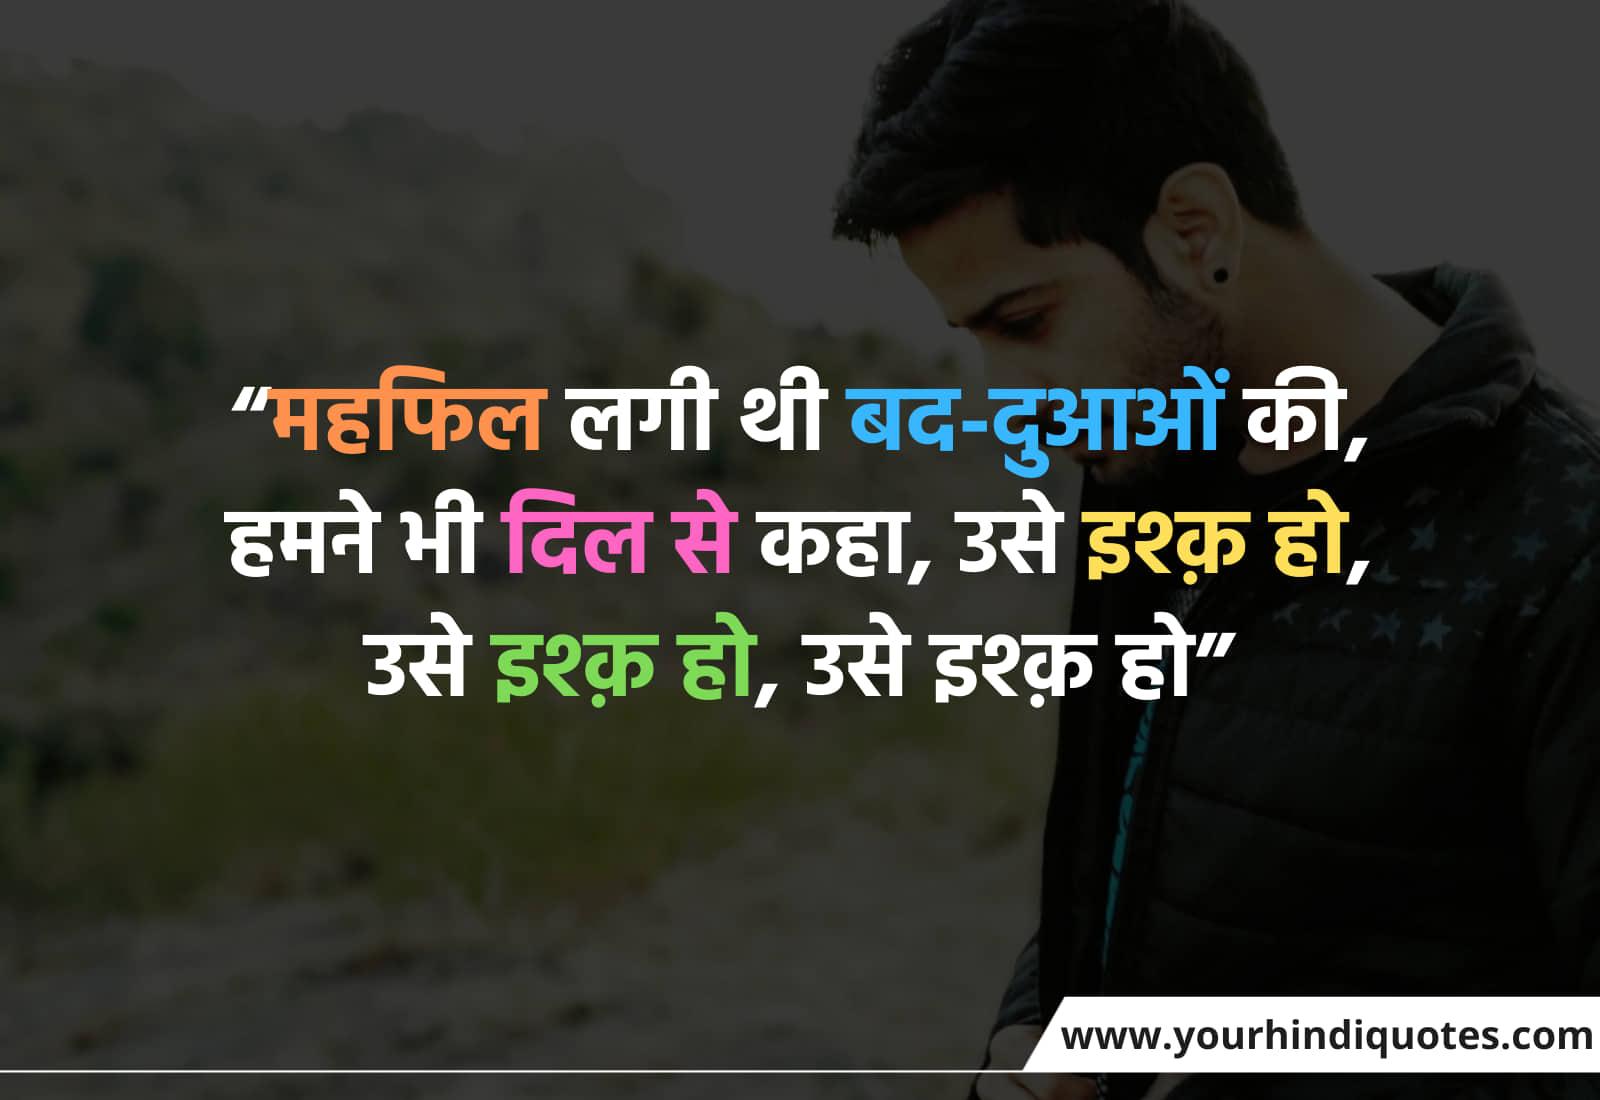 Hindi Bewafa Shayari